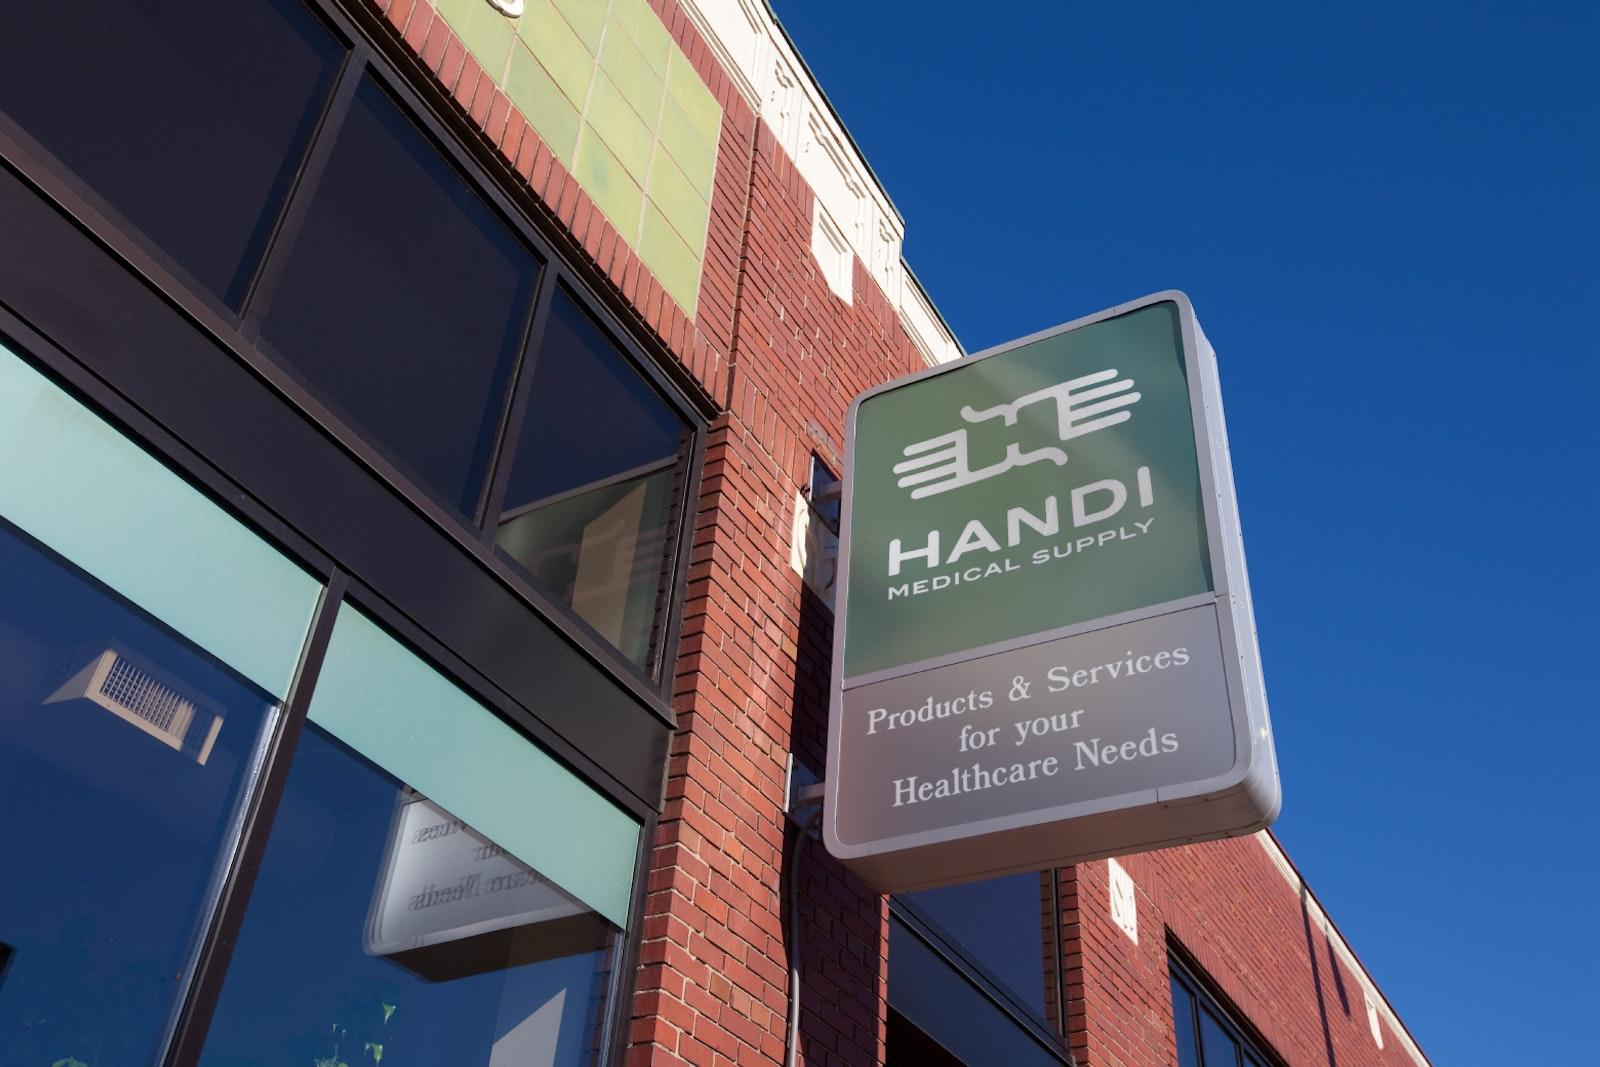 Handi Medical Sign